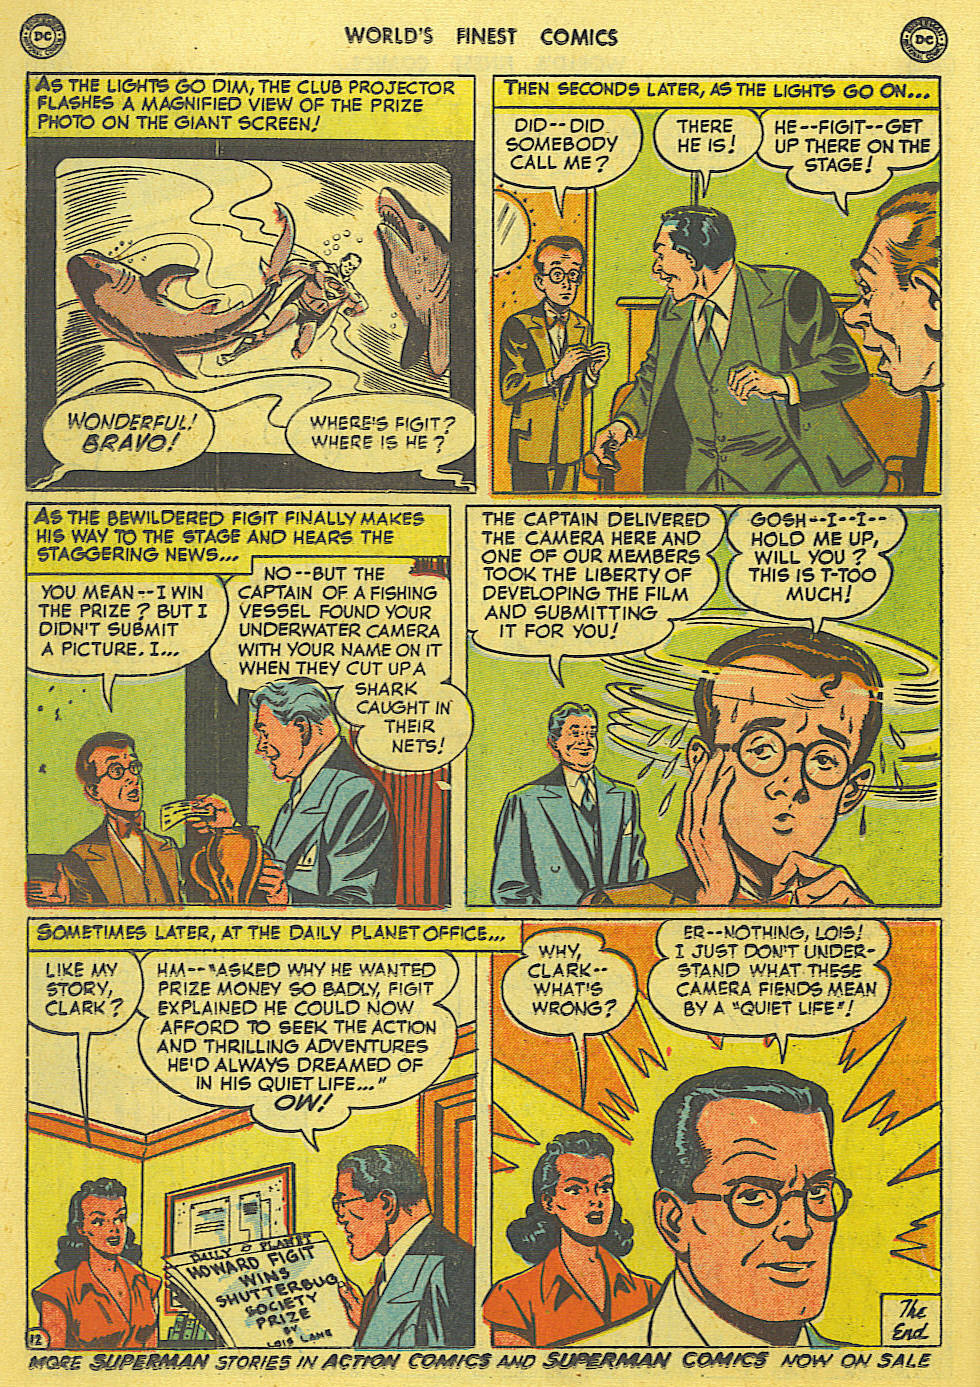 Read online World's Finest Comics comic -  Issue #49 - 15